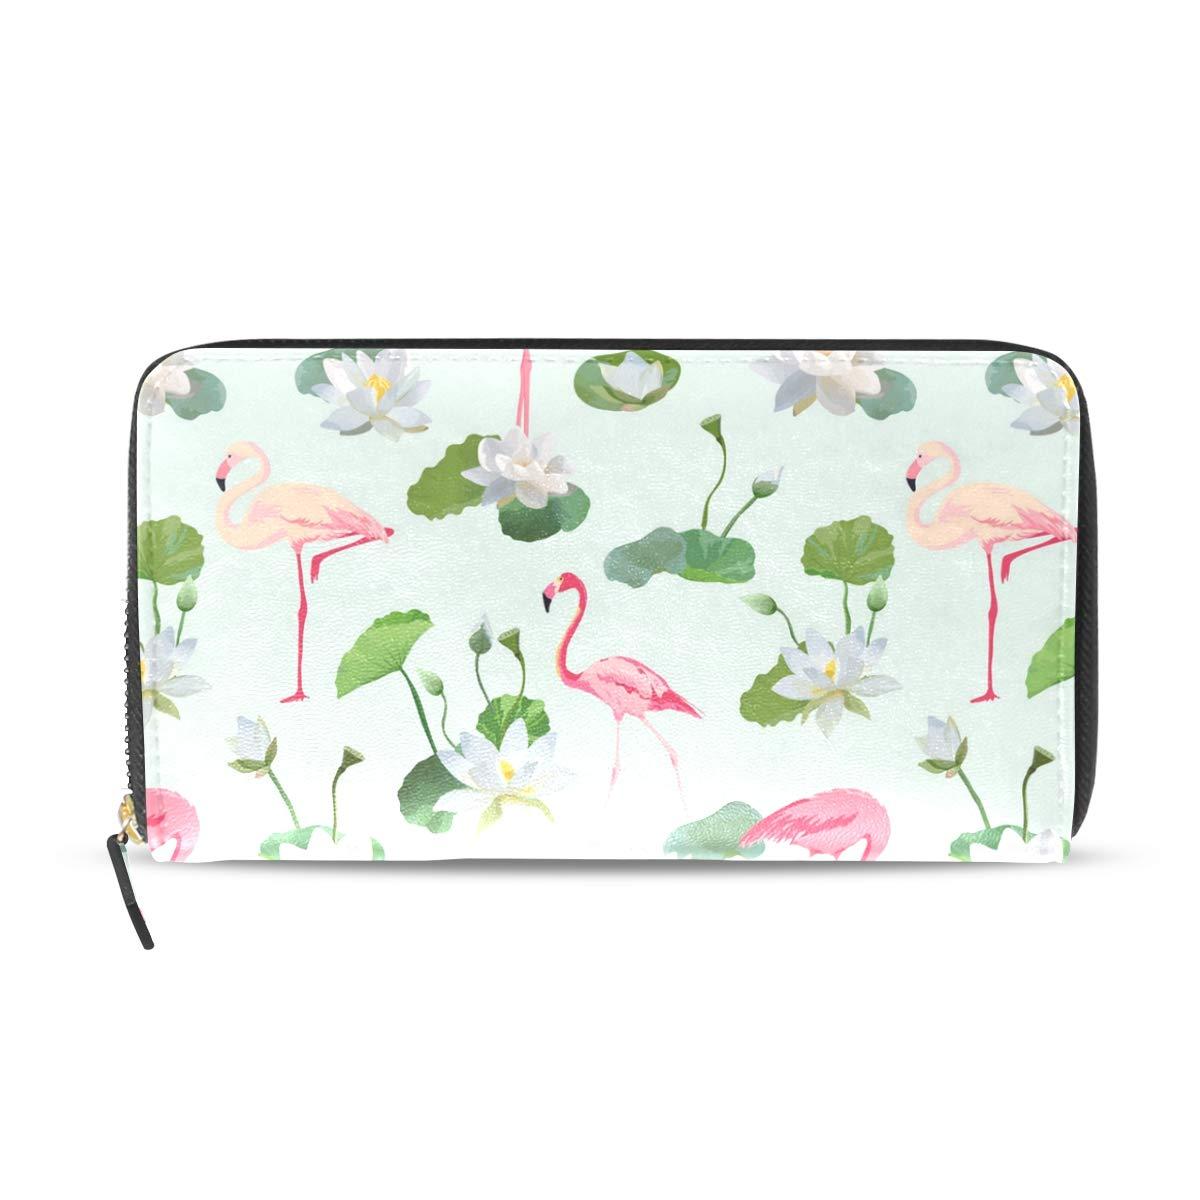 Flamingo Wallets For Men Women Long Leather Checkbook Card Holder Purse Zipper Buckle Elegant Clutch Ladies Coin Purse